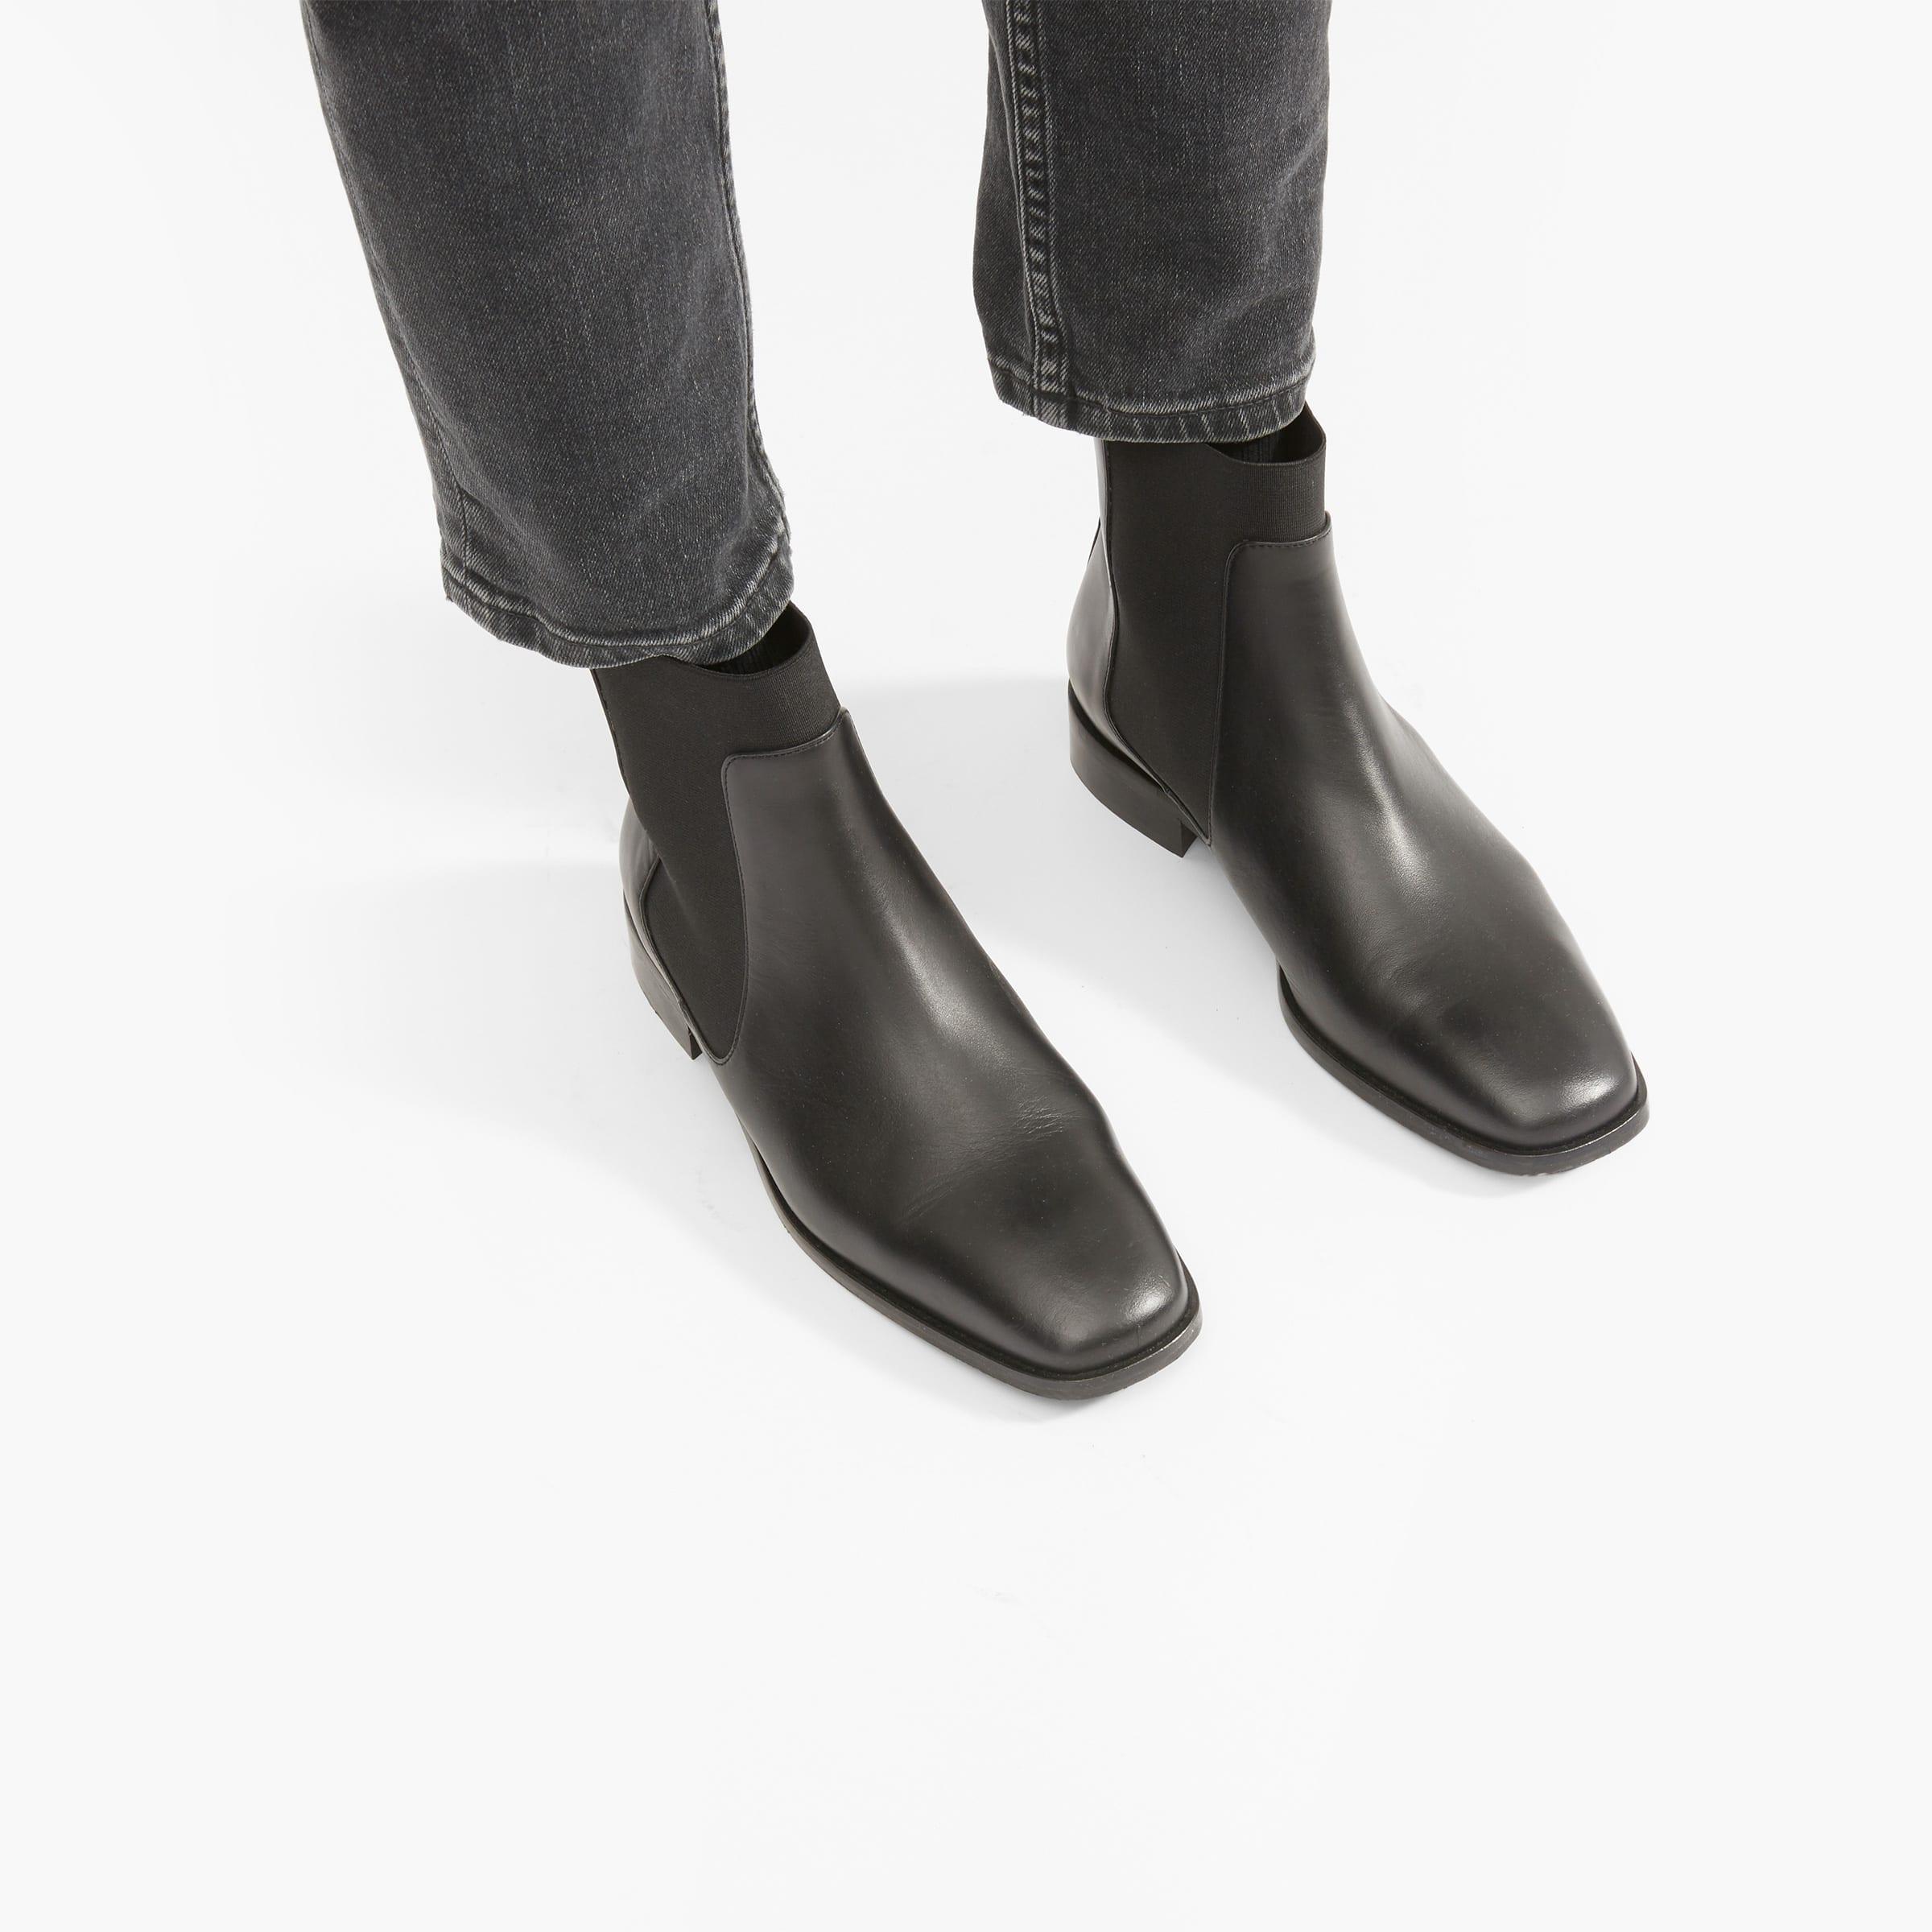 The Square Toe Chelsea Boot Everlane